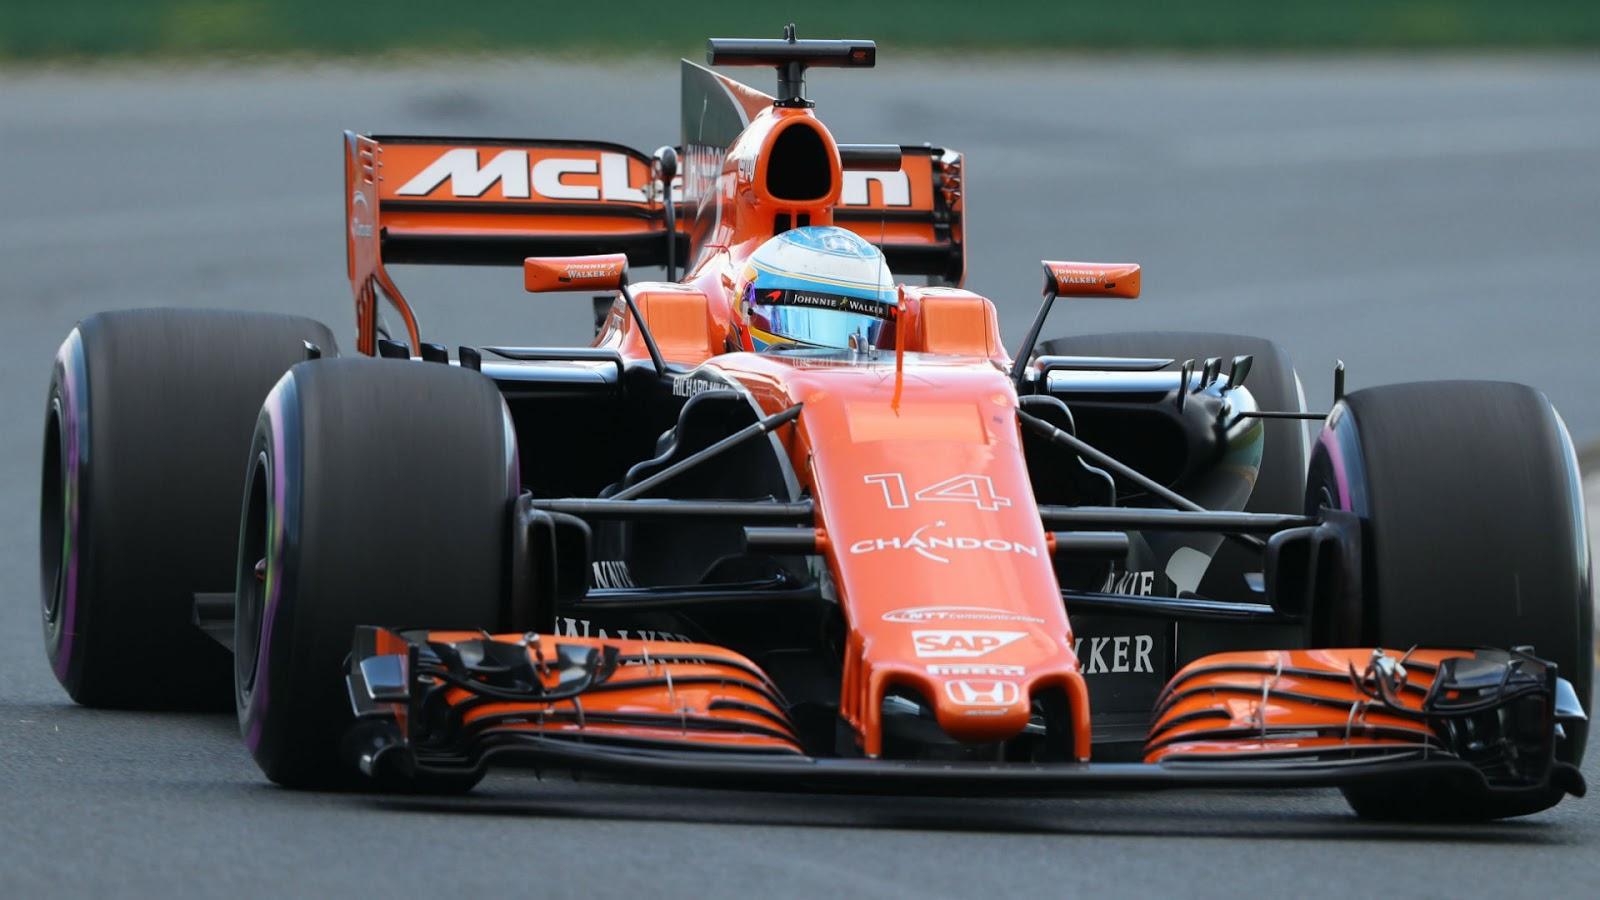 McLaren και Honda διακόπτουν τη συνεργασία τους στη F1